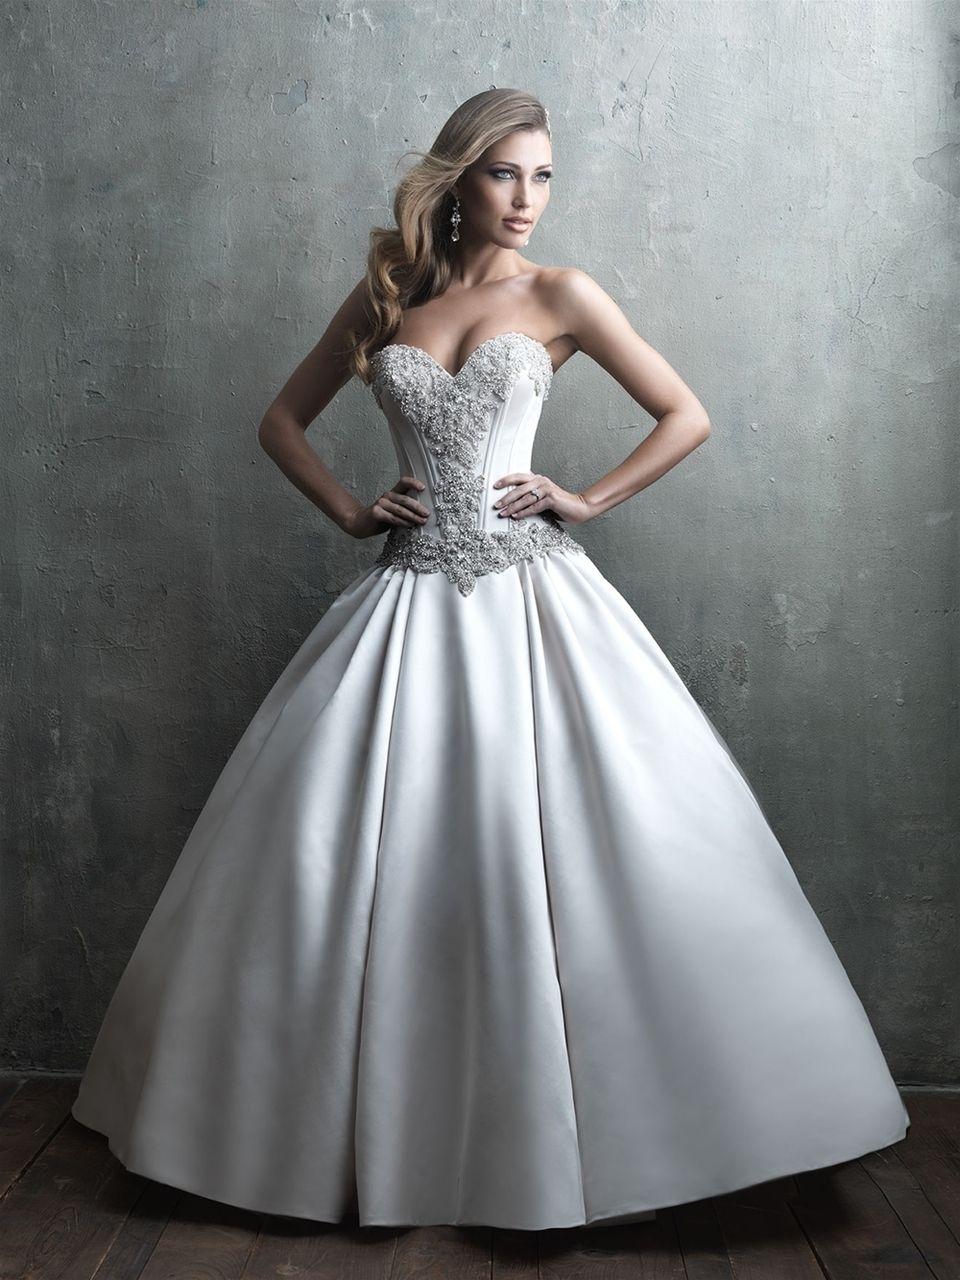 Bridals by lori allure couture bridals 0126433 call for pricing bridals by lori allure couture bridals 0126433 call for pricing http couture wedding dressescouture ombrellifo Images